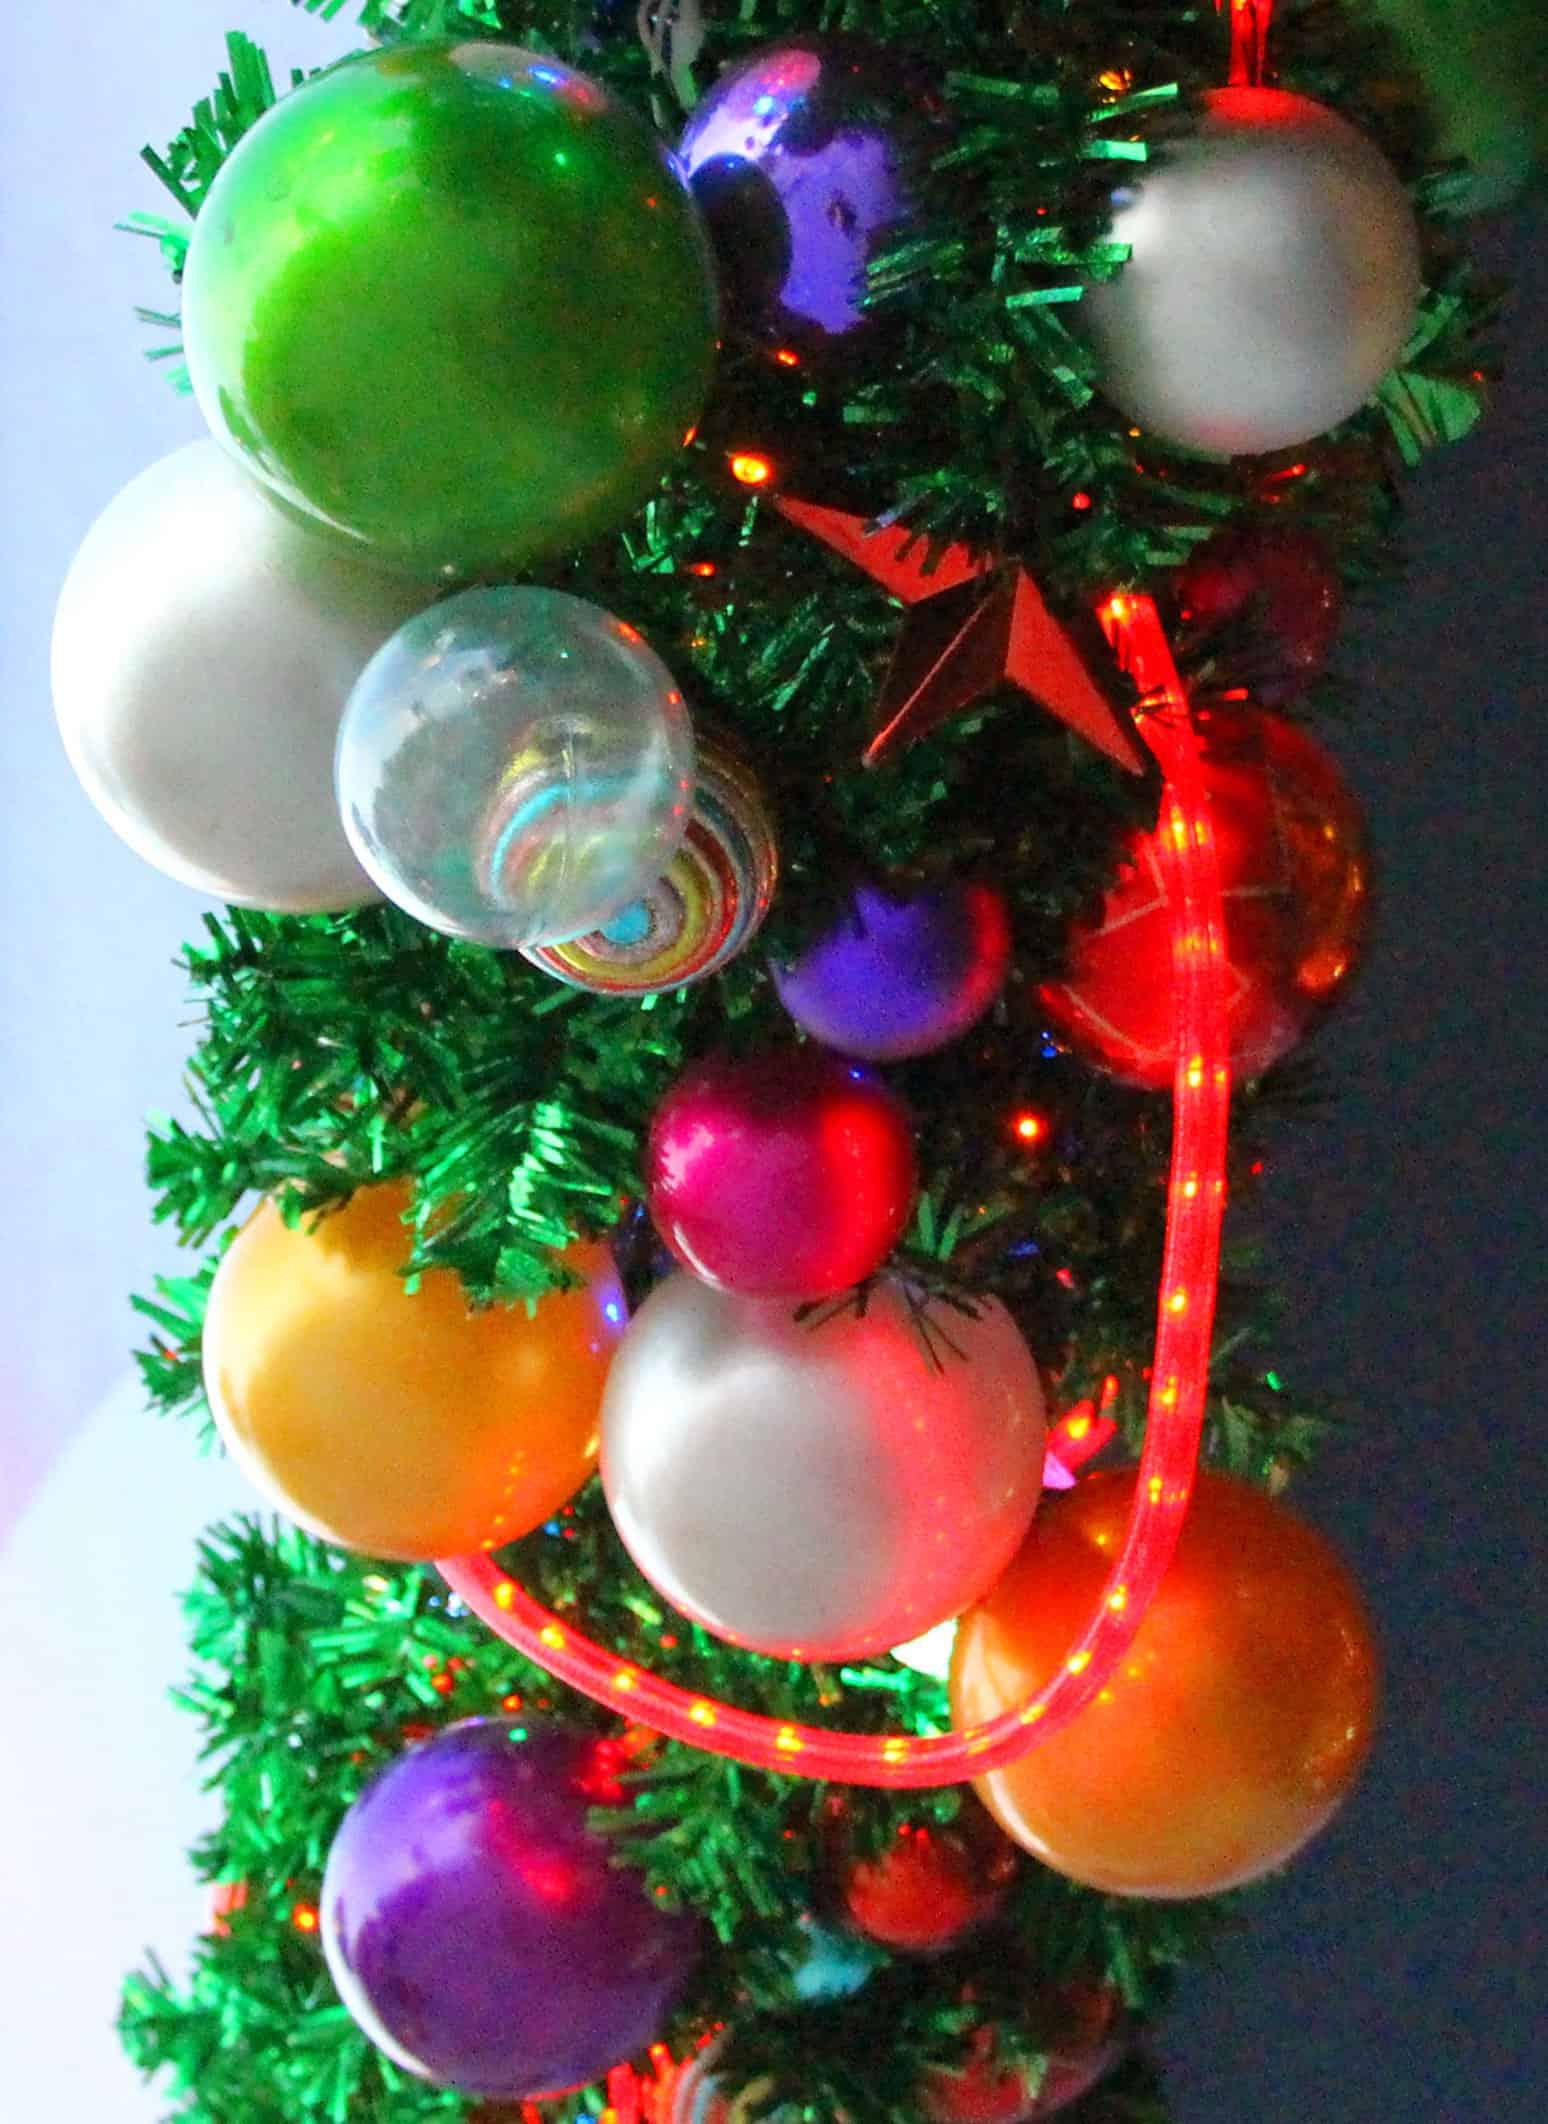 kunststoff weihnachtskugeln bunt weihnachtskugeln. Black Bedroom Furniture Sets. Home Design Ideas